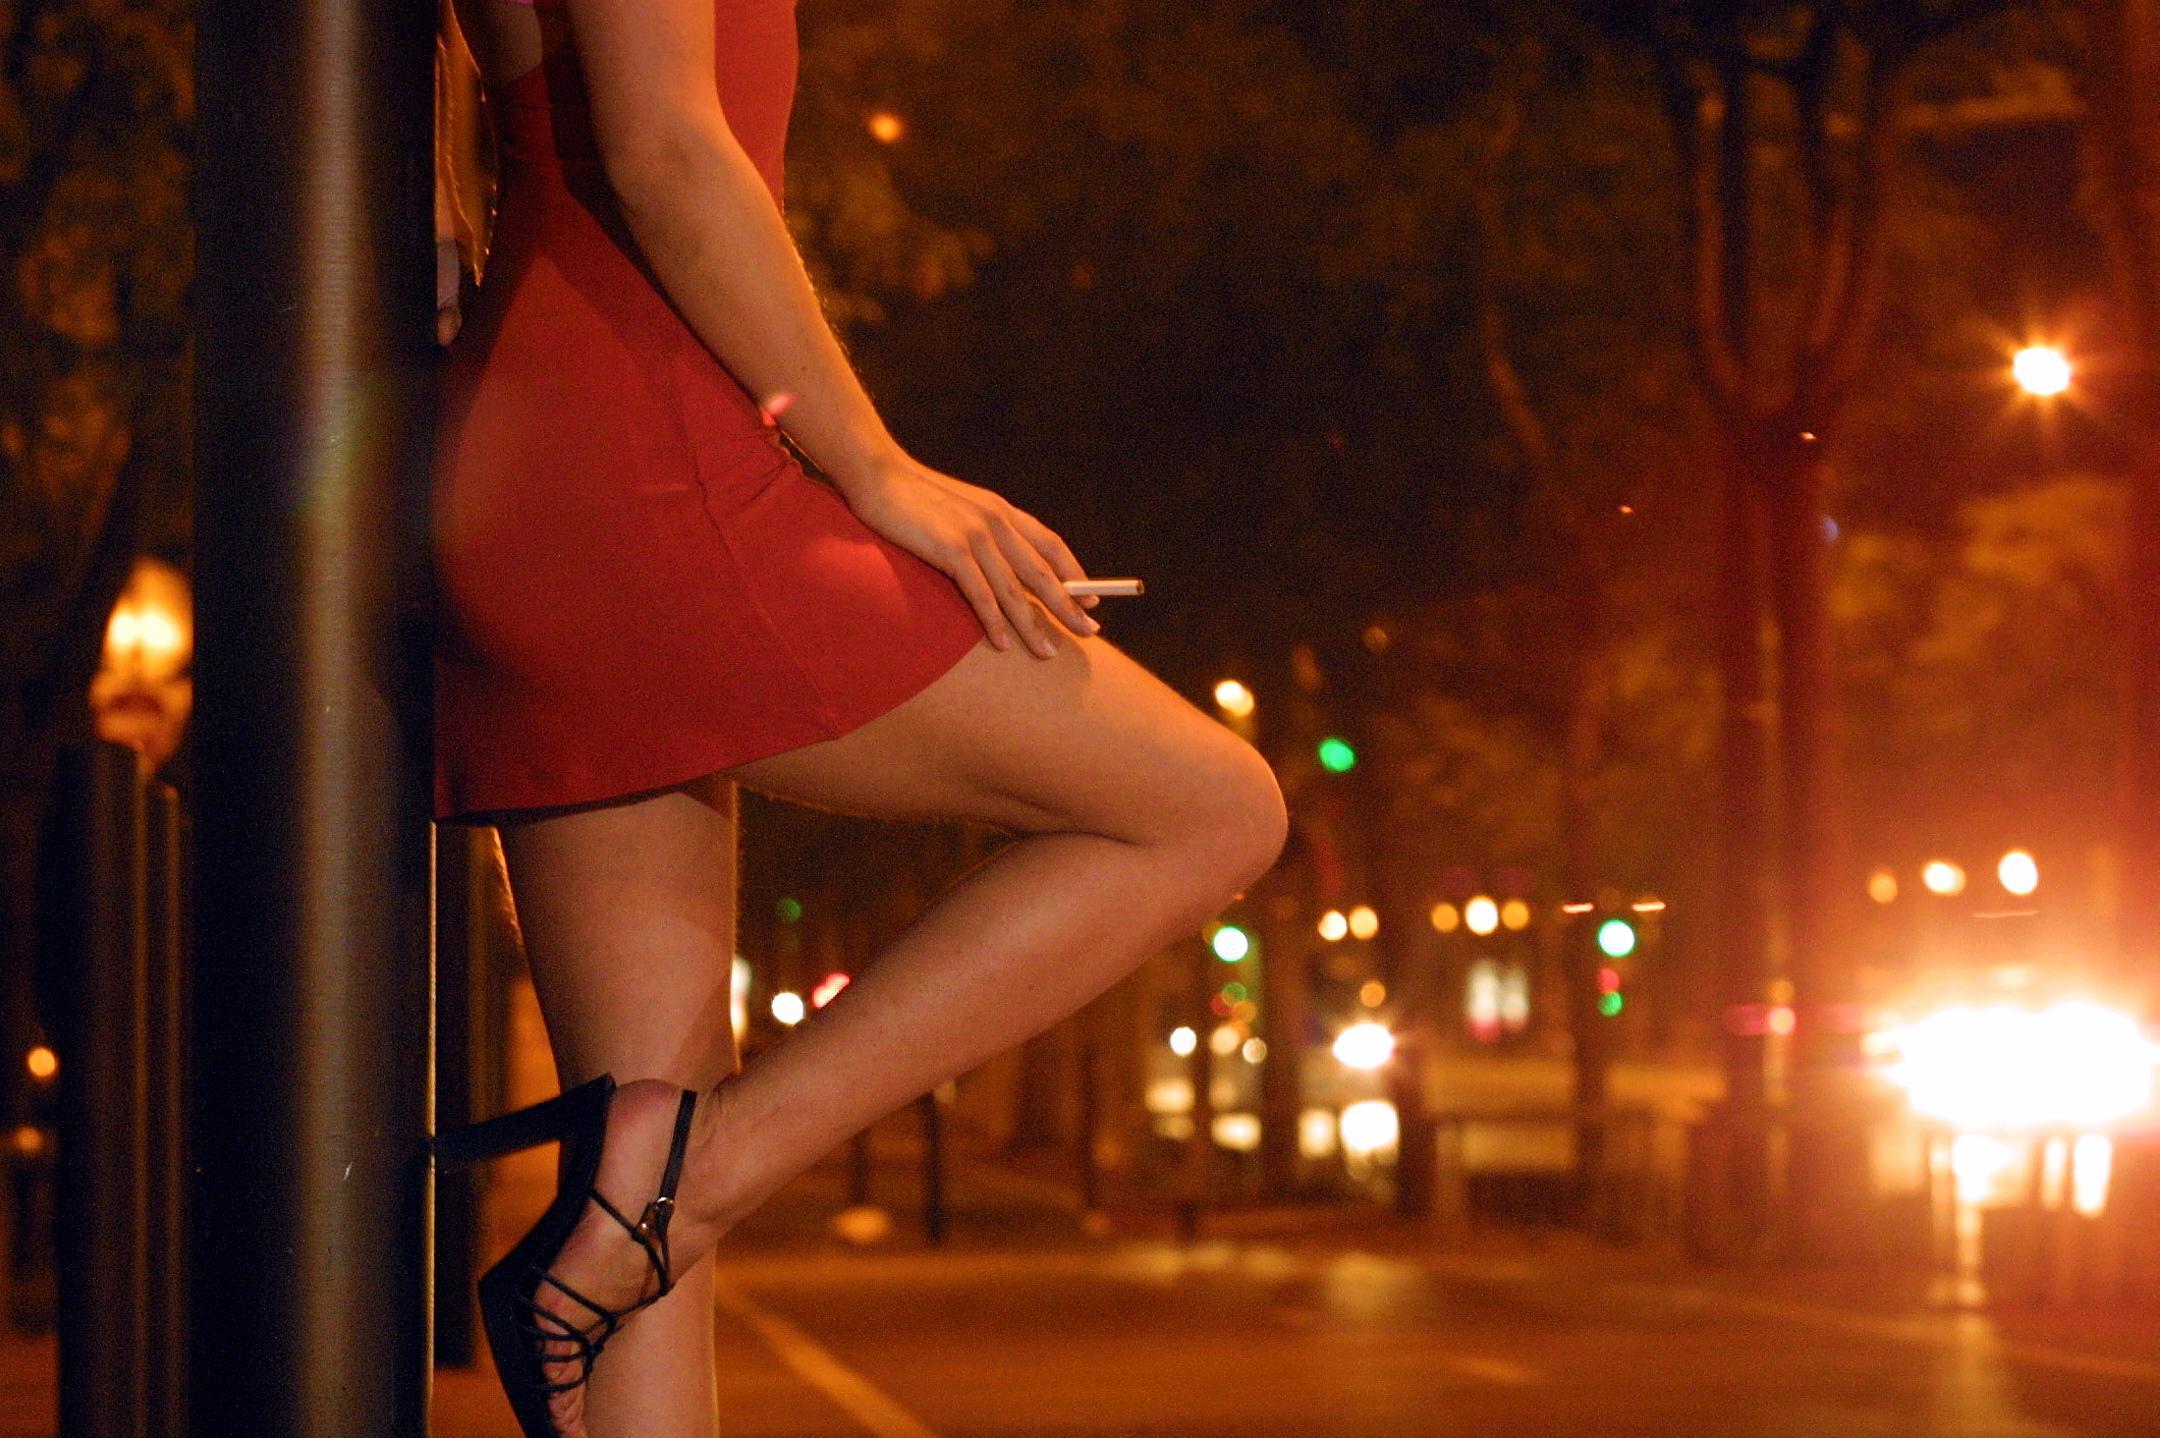 nude-emo-prostitution-girl